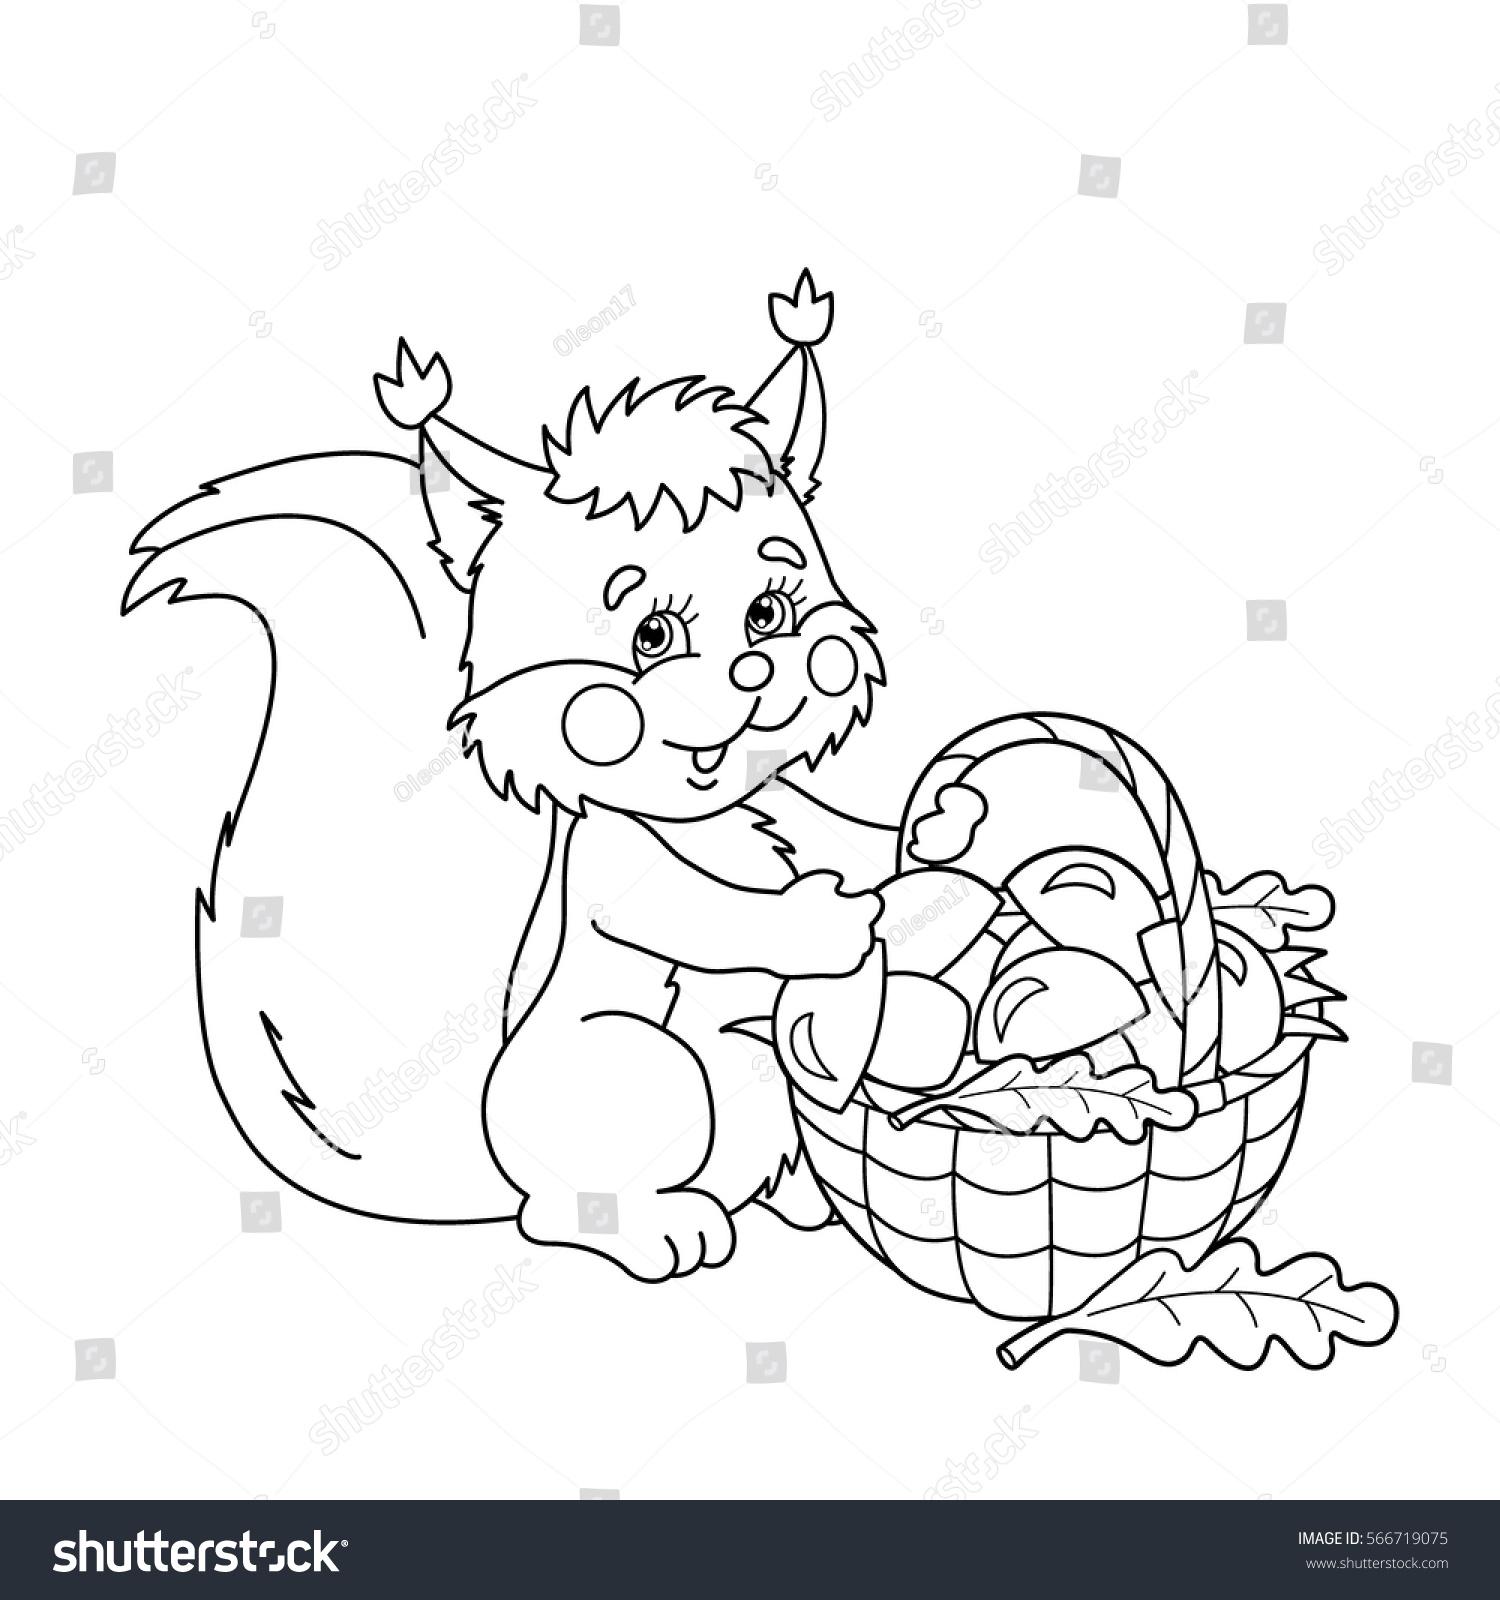 coloring page outline cartoon squirrel basket stock vector